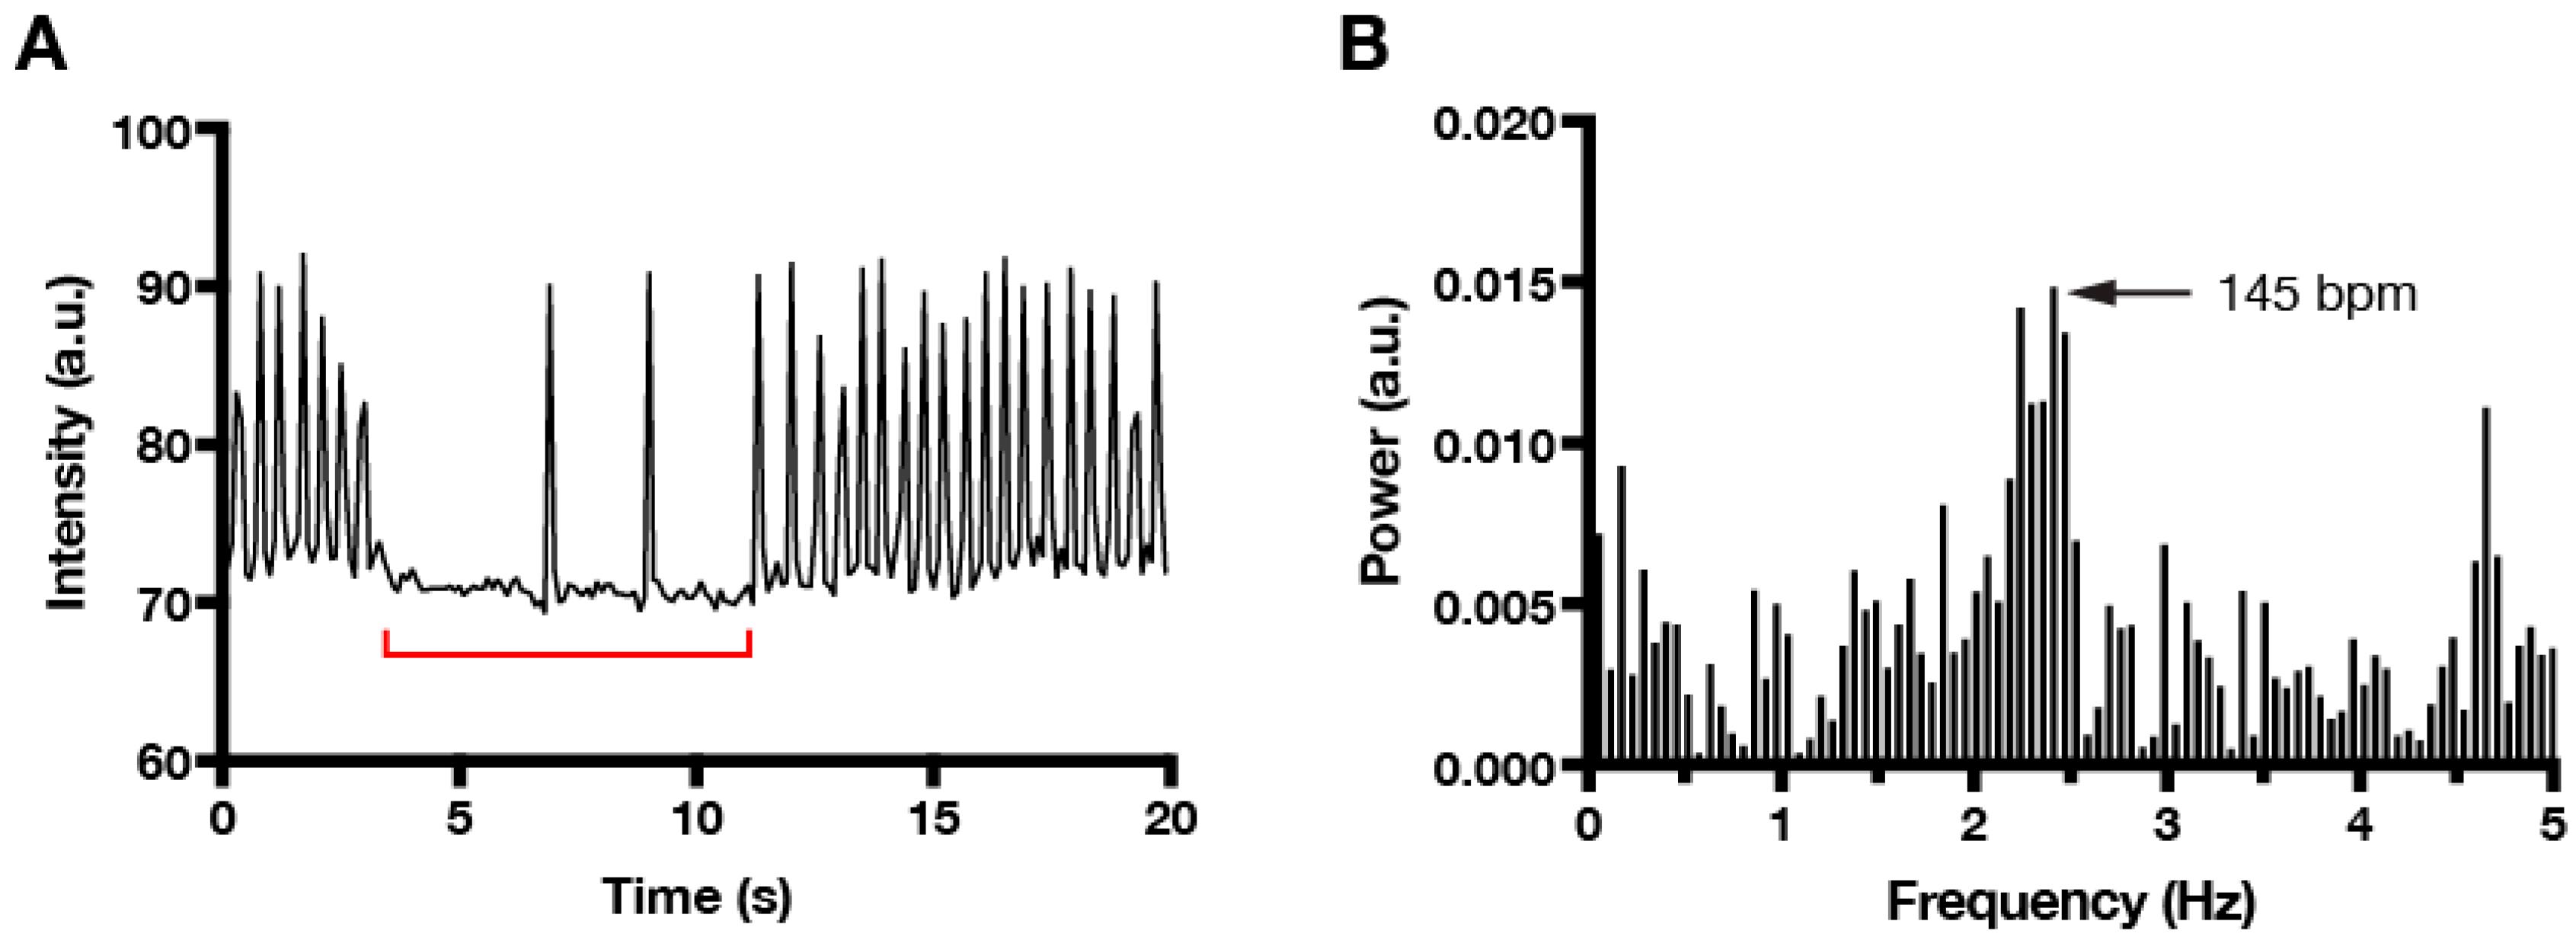 Photonics | Free Full-Text | Quantification of Cardiomyocyte